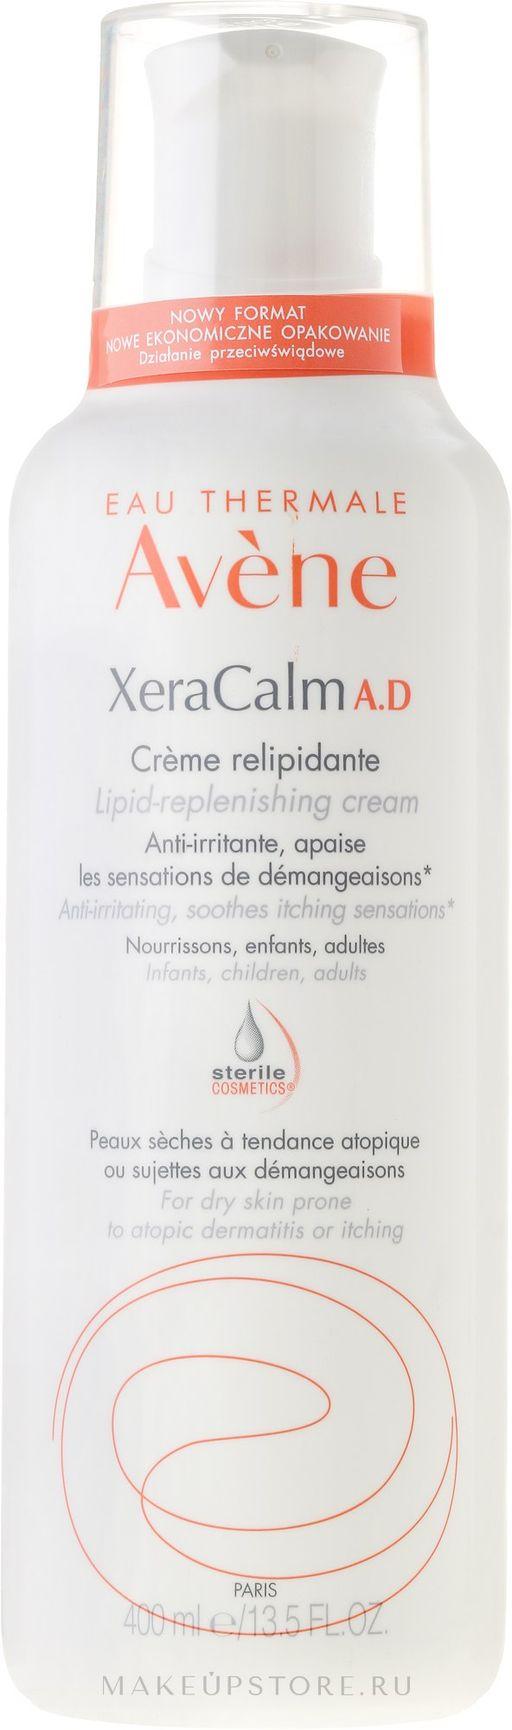 Avene XeraCalm A.D крем липидовосполняющий, крем, 400 мл, 1шт.